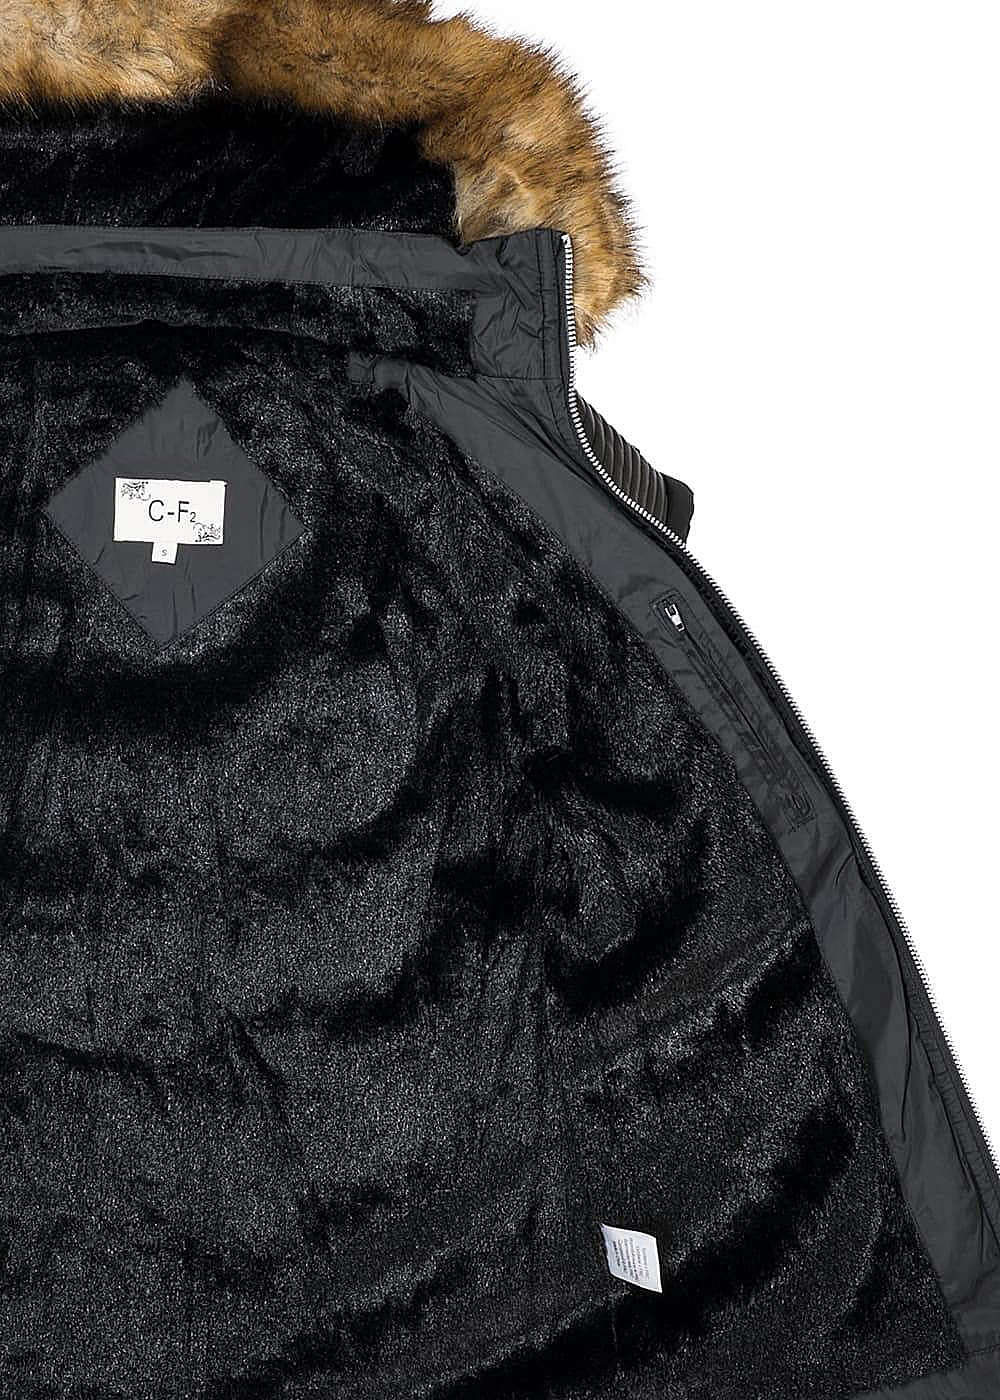 seventyseven lifestyle jacke damen winter jacke mit g rtel. Black Bedroom Furniture Sets. Home Design Ideas